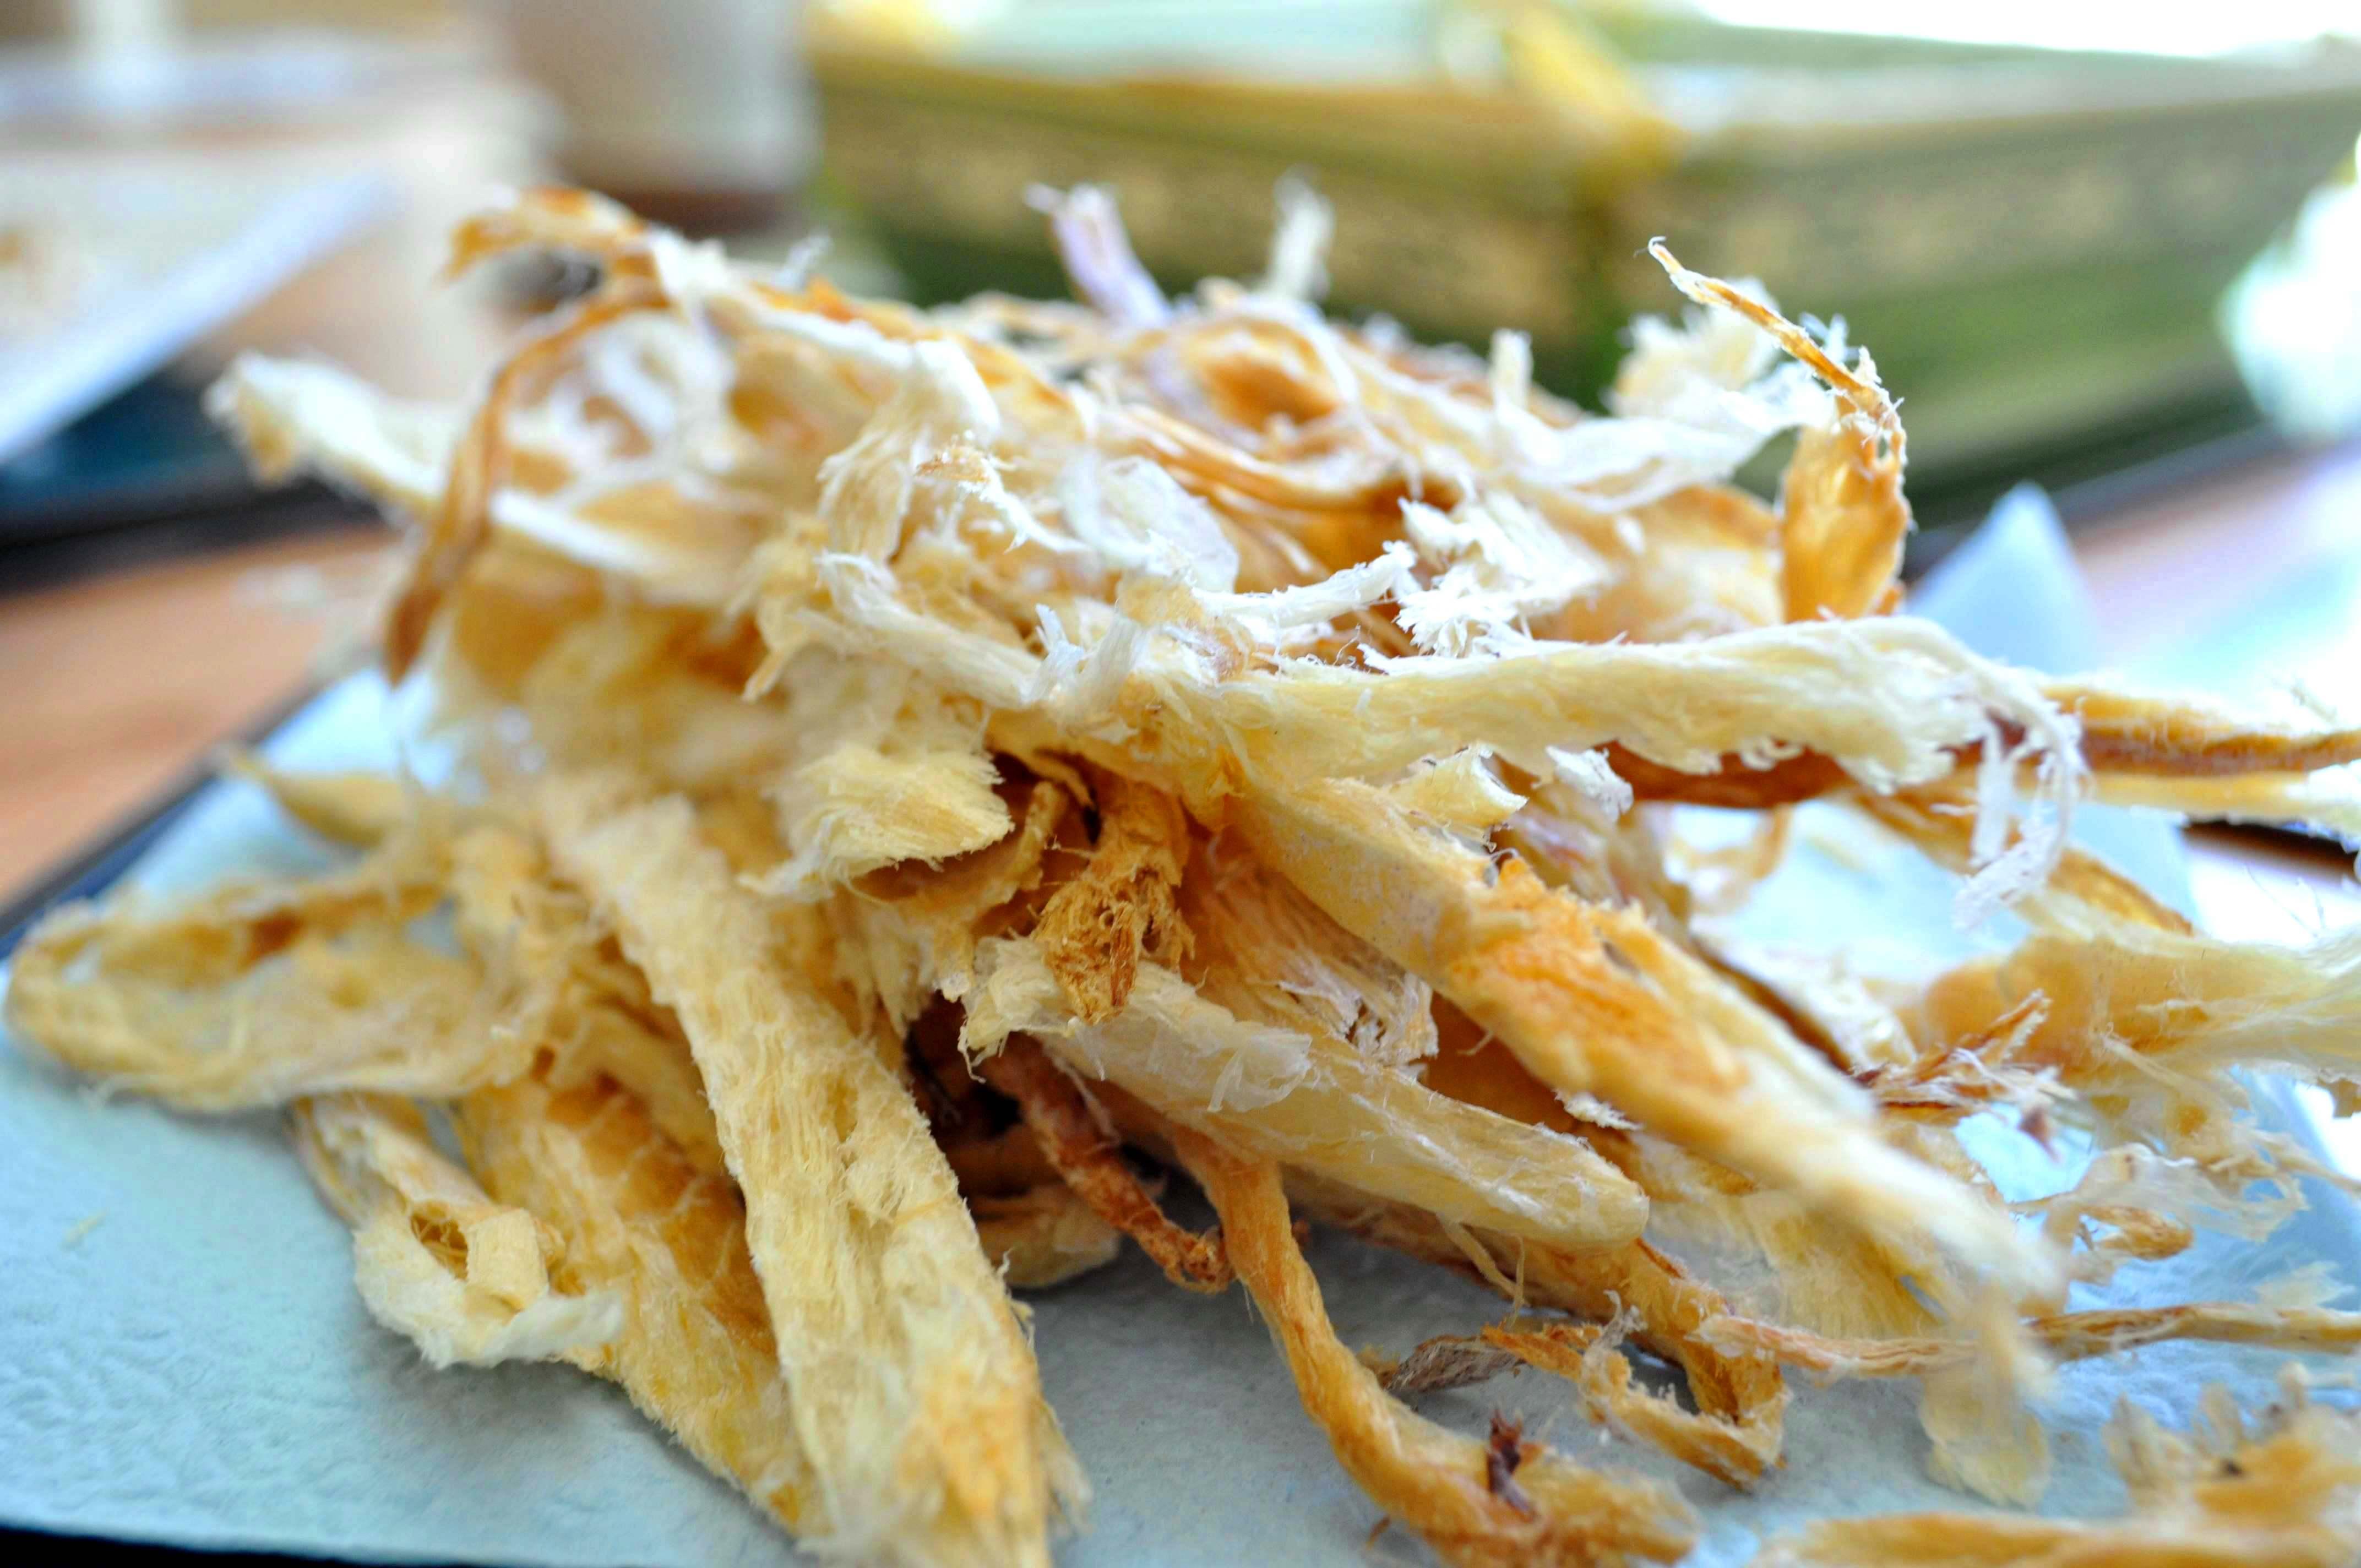 bugeo (dried pollock) strips